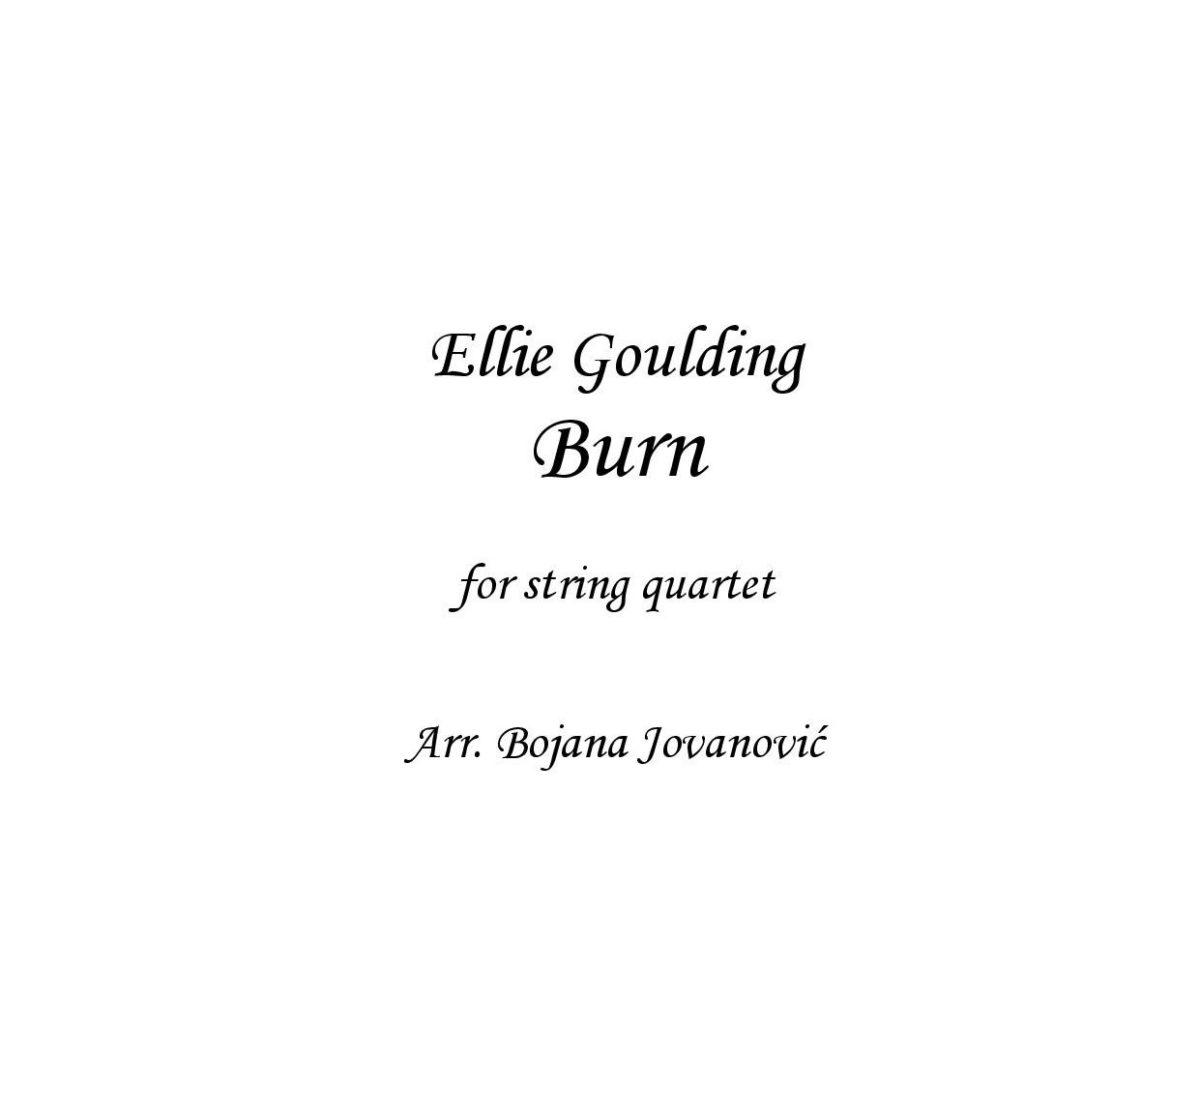 Burn (Ellie Goulding) - Sheet Music